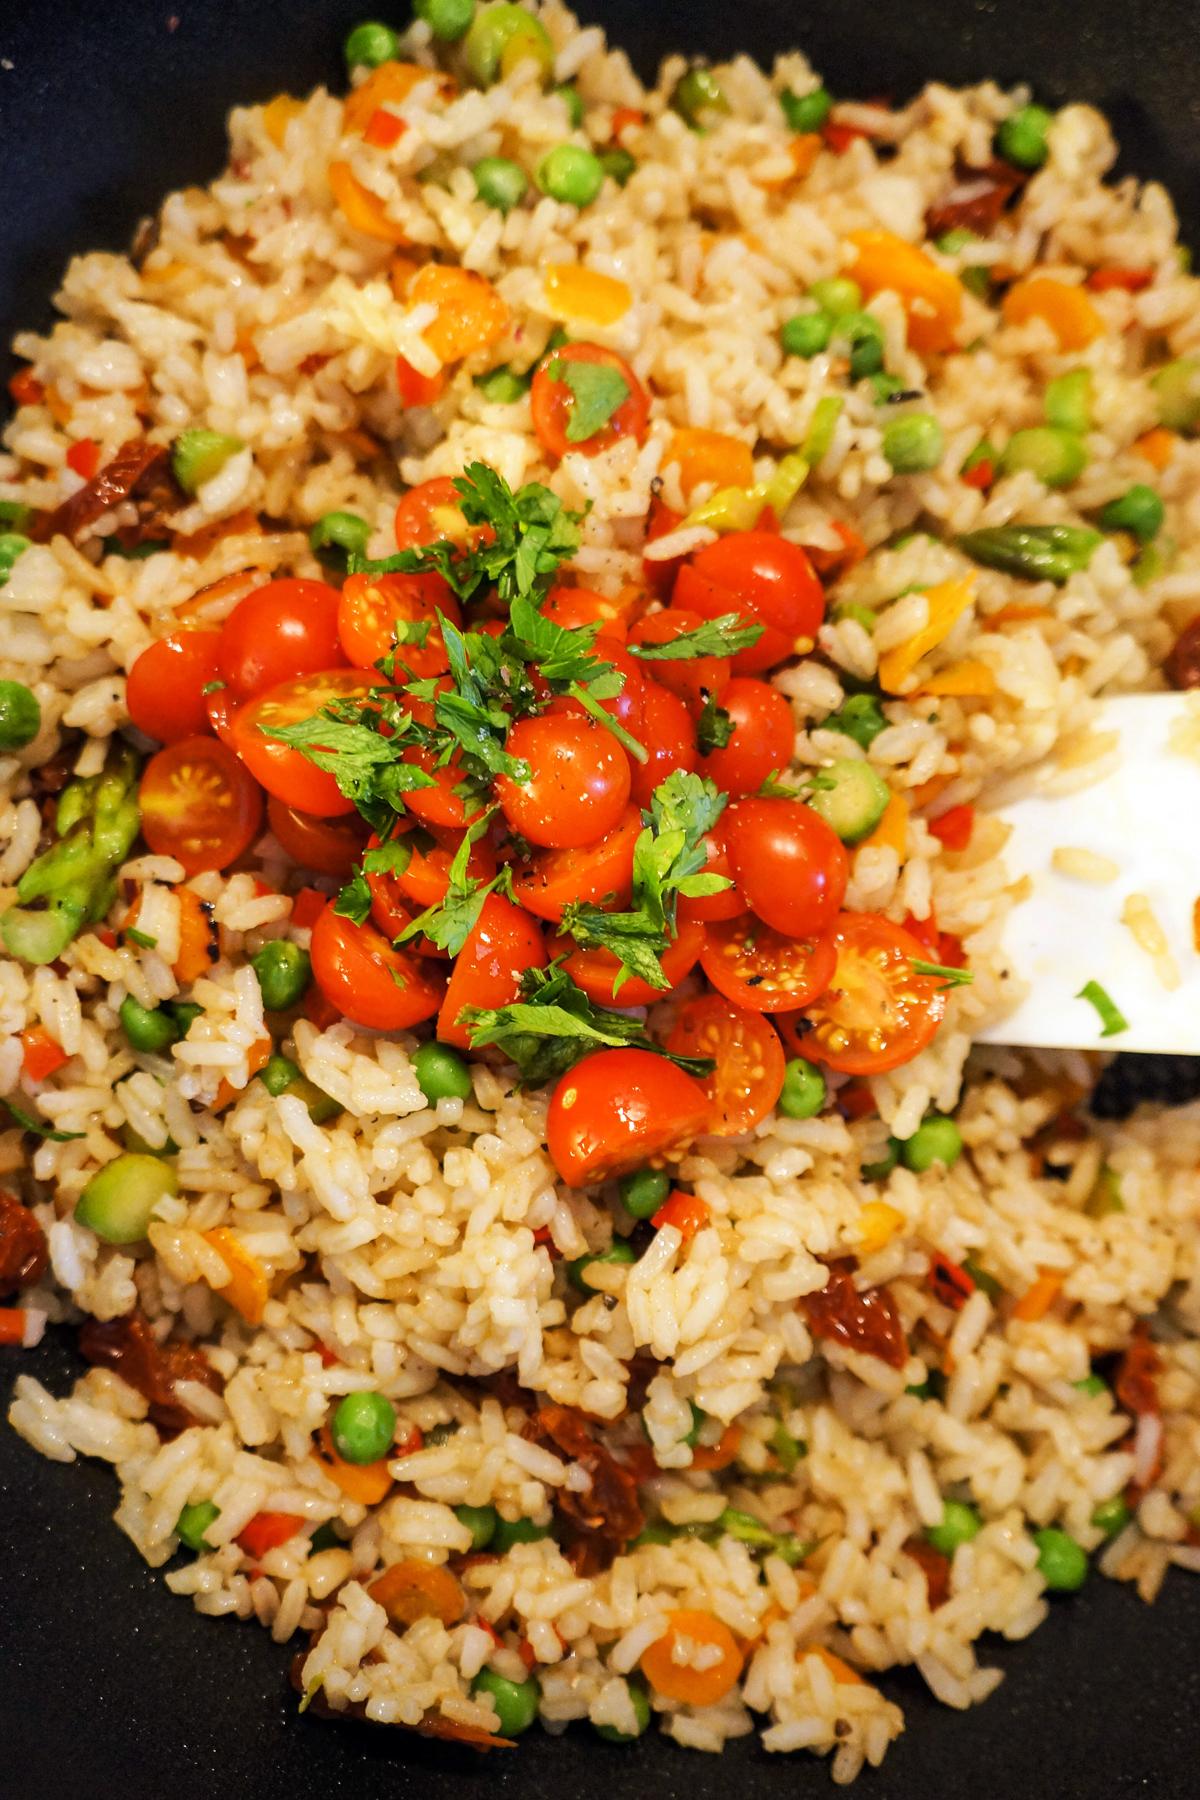 Pražen riž s paradižniki